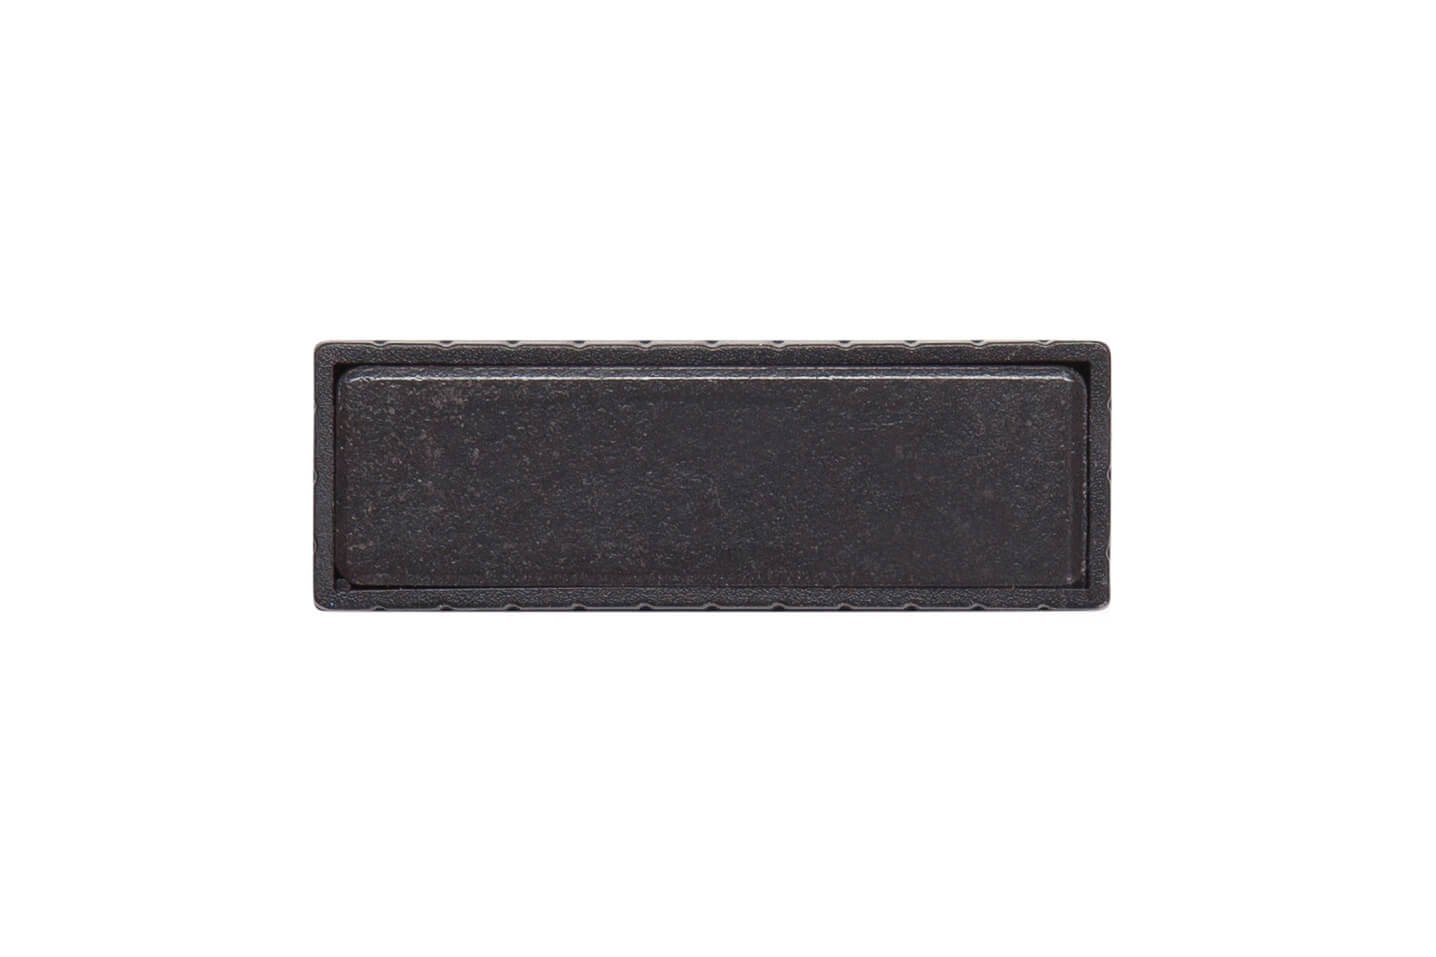 Magnet MAULsolid 54 x 19 mm, 1 kg Haftkraft, 10 St./Ktn., schwarz